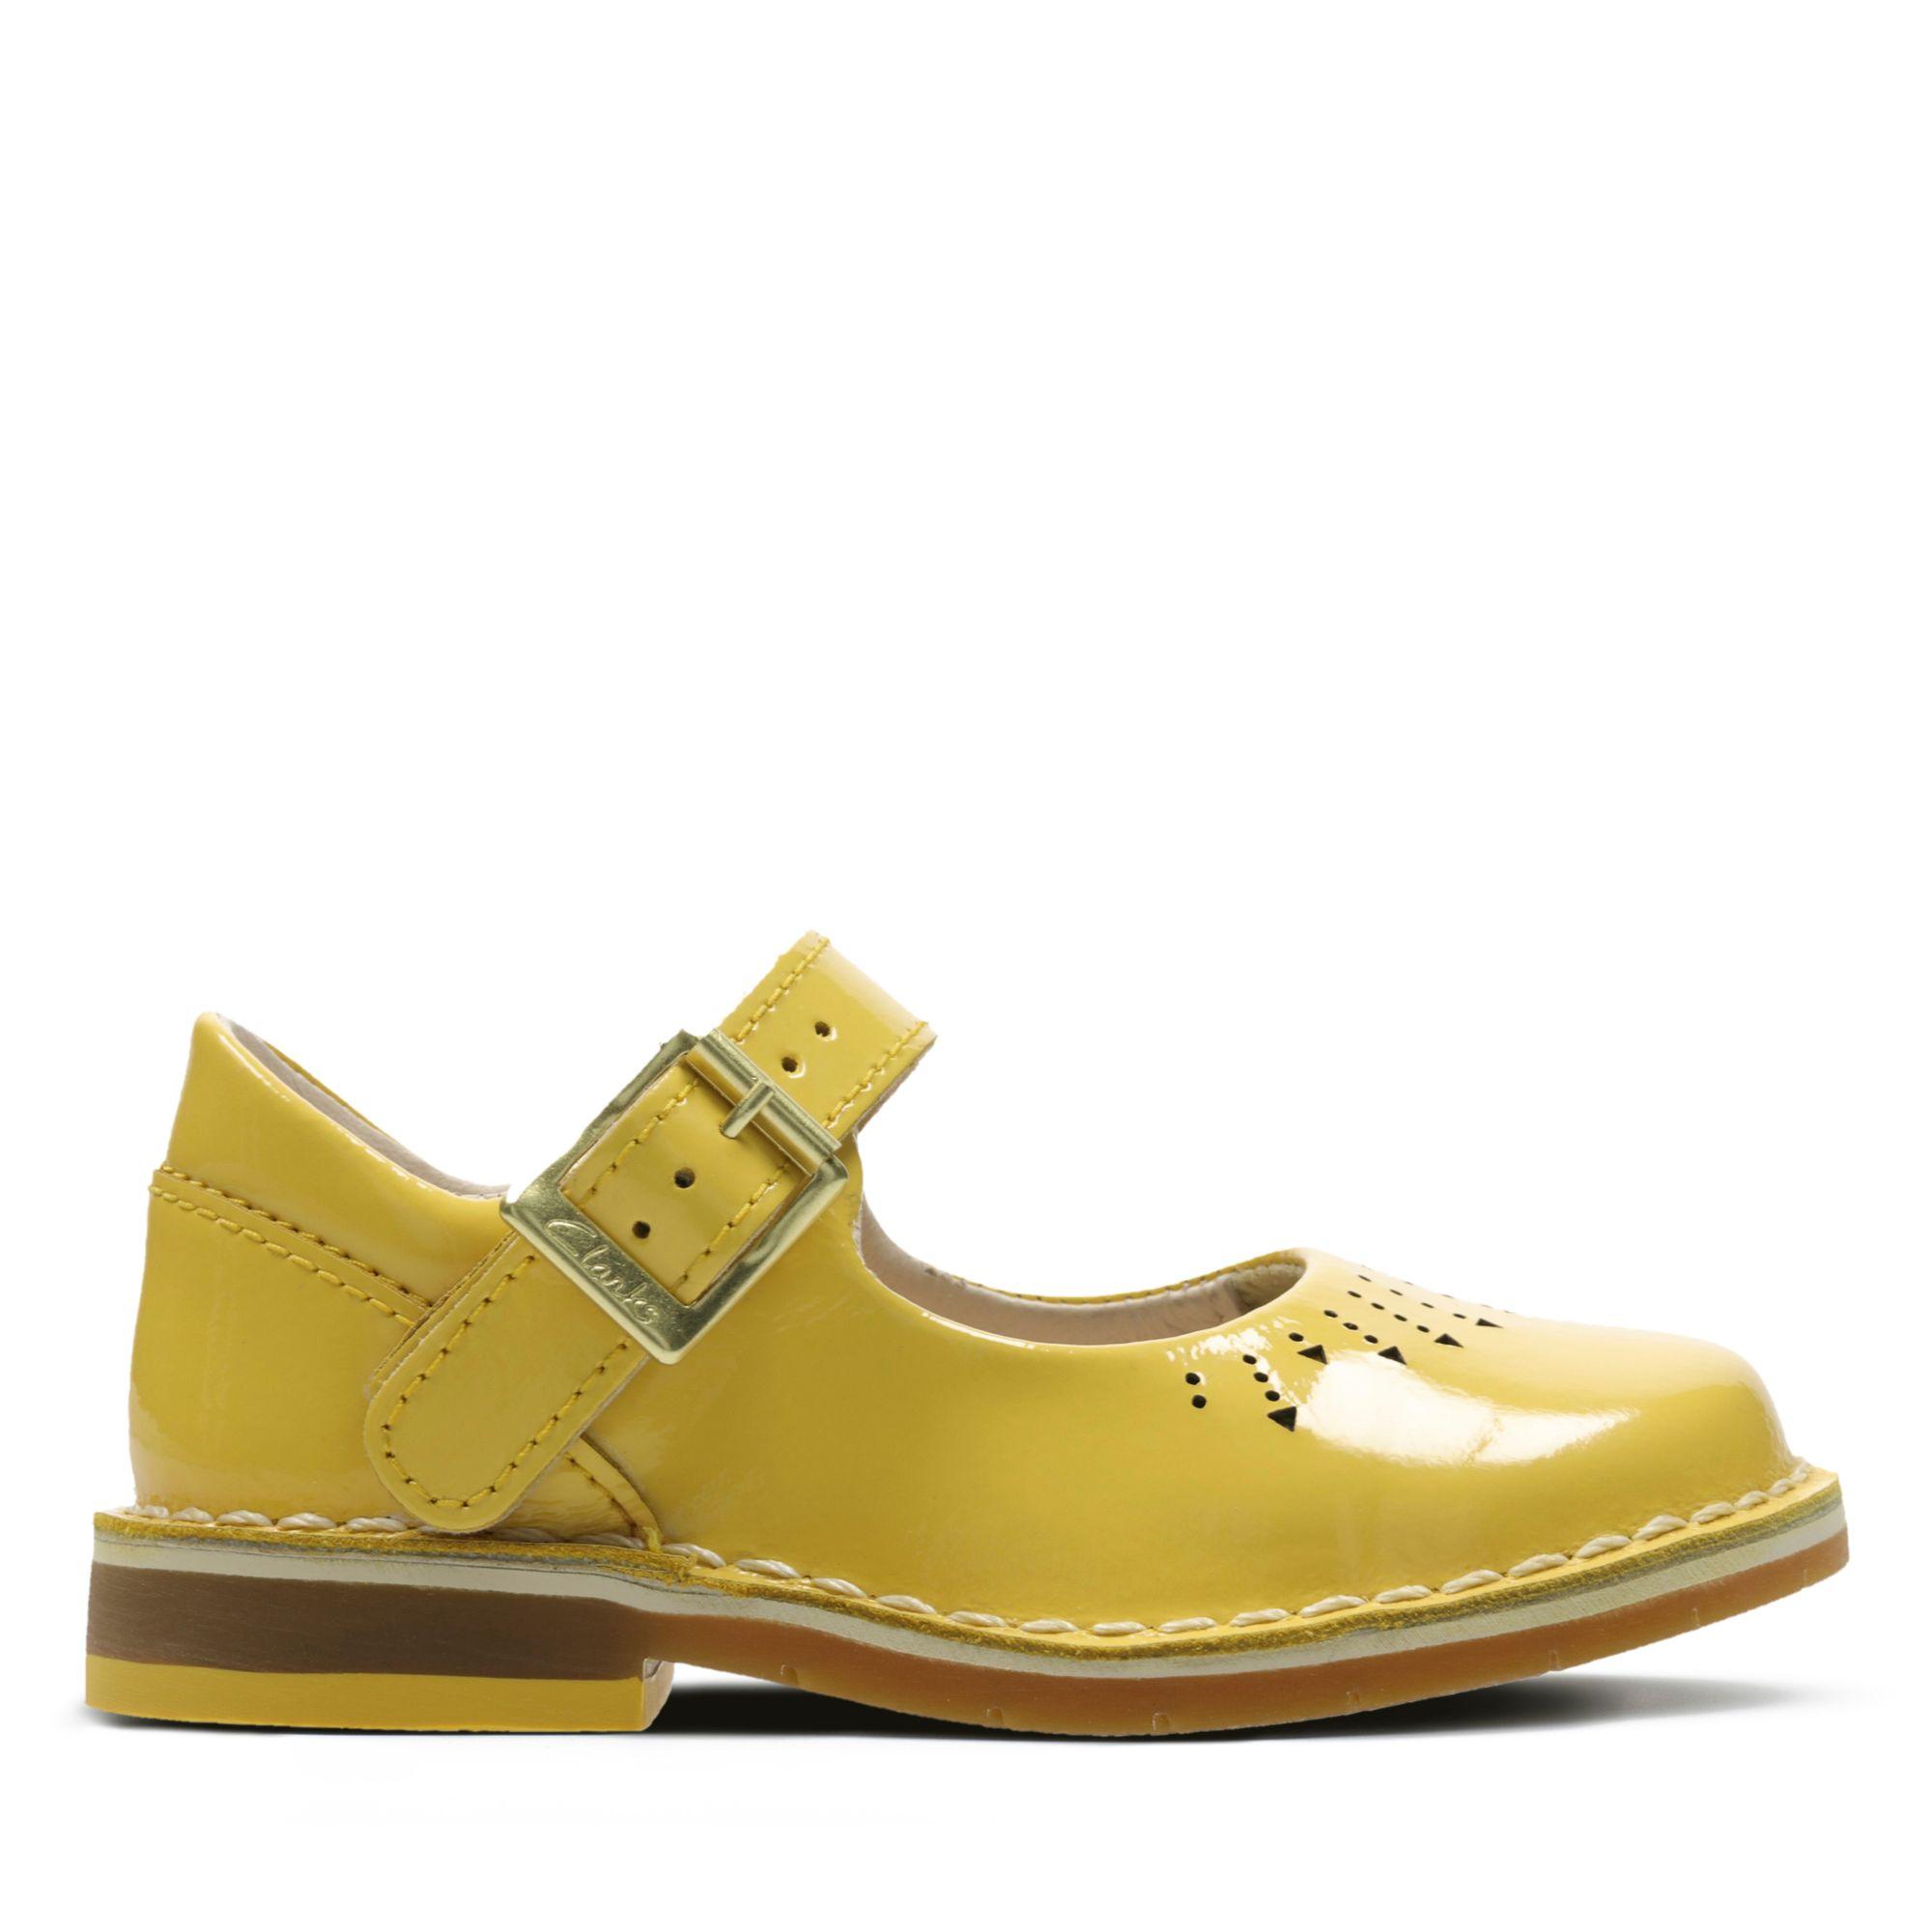 Retro Vintage Flats and Low Heel Shoes Yarn Jump £34.00 AT vintagedancer.com